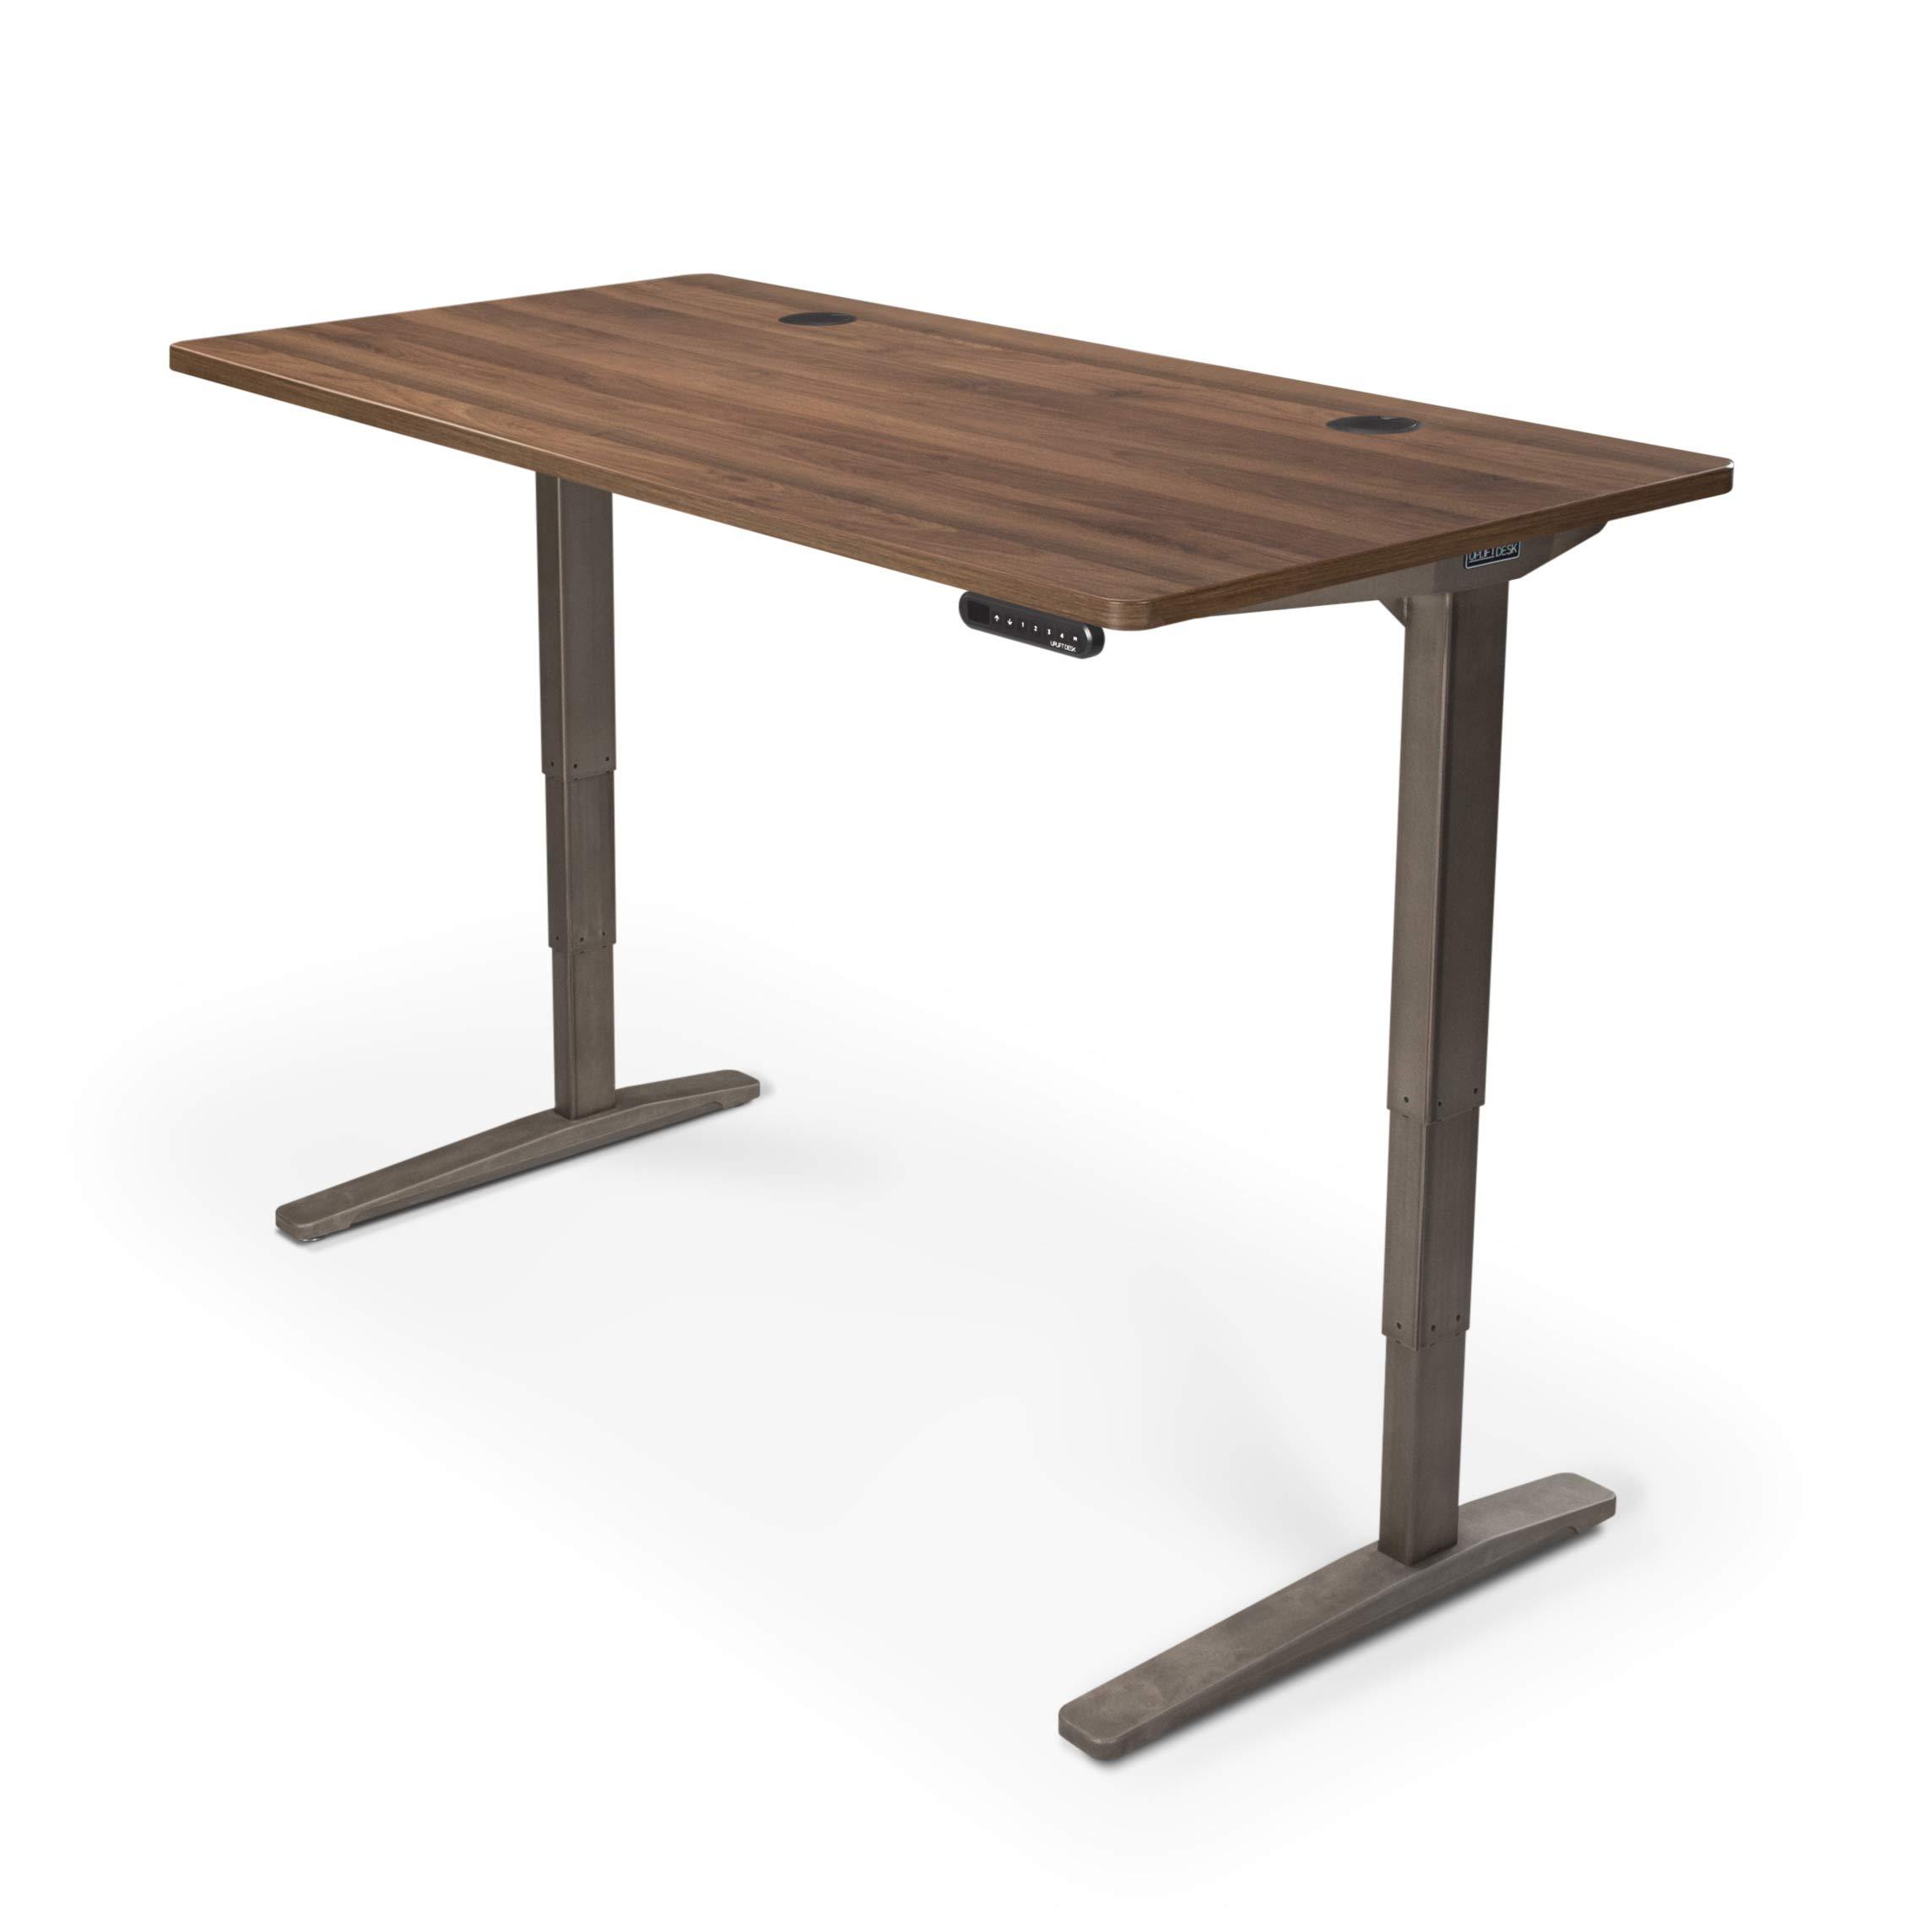 UPLIFT Desk - V2 Standing Desk with Walnut GREENGUARD Laminate Desktop, Height Adjustable Frame (Industrial), Advanced Memory Keypad & Wire Grommets (Black), Bamboo Motion-X Board (80'' x 30'') by UPLIFT Desk